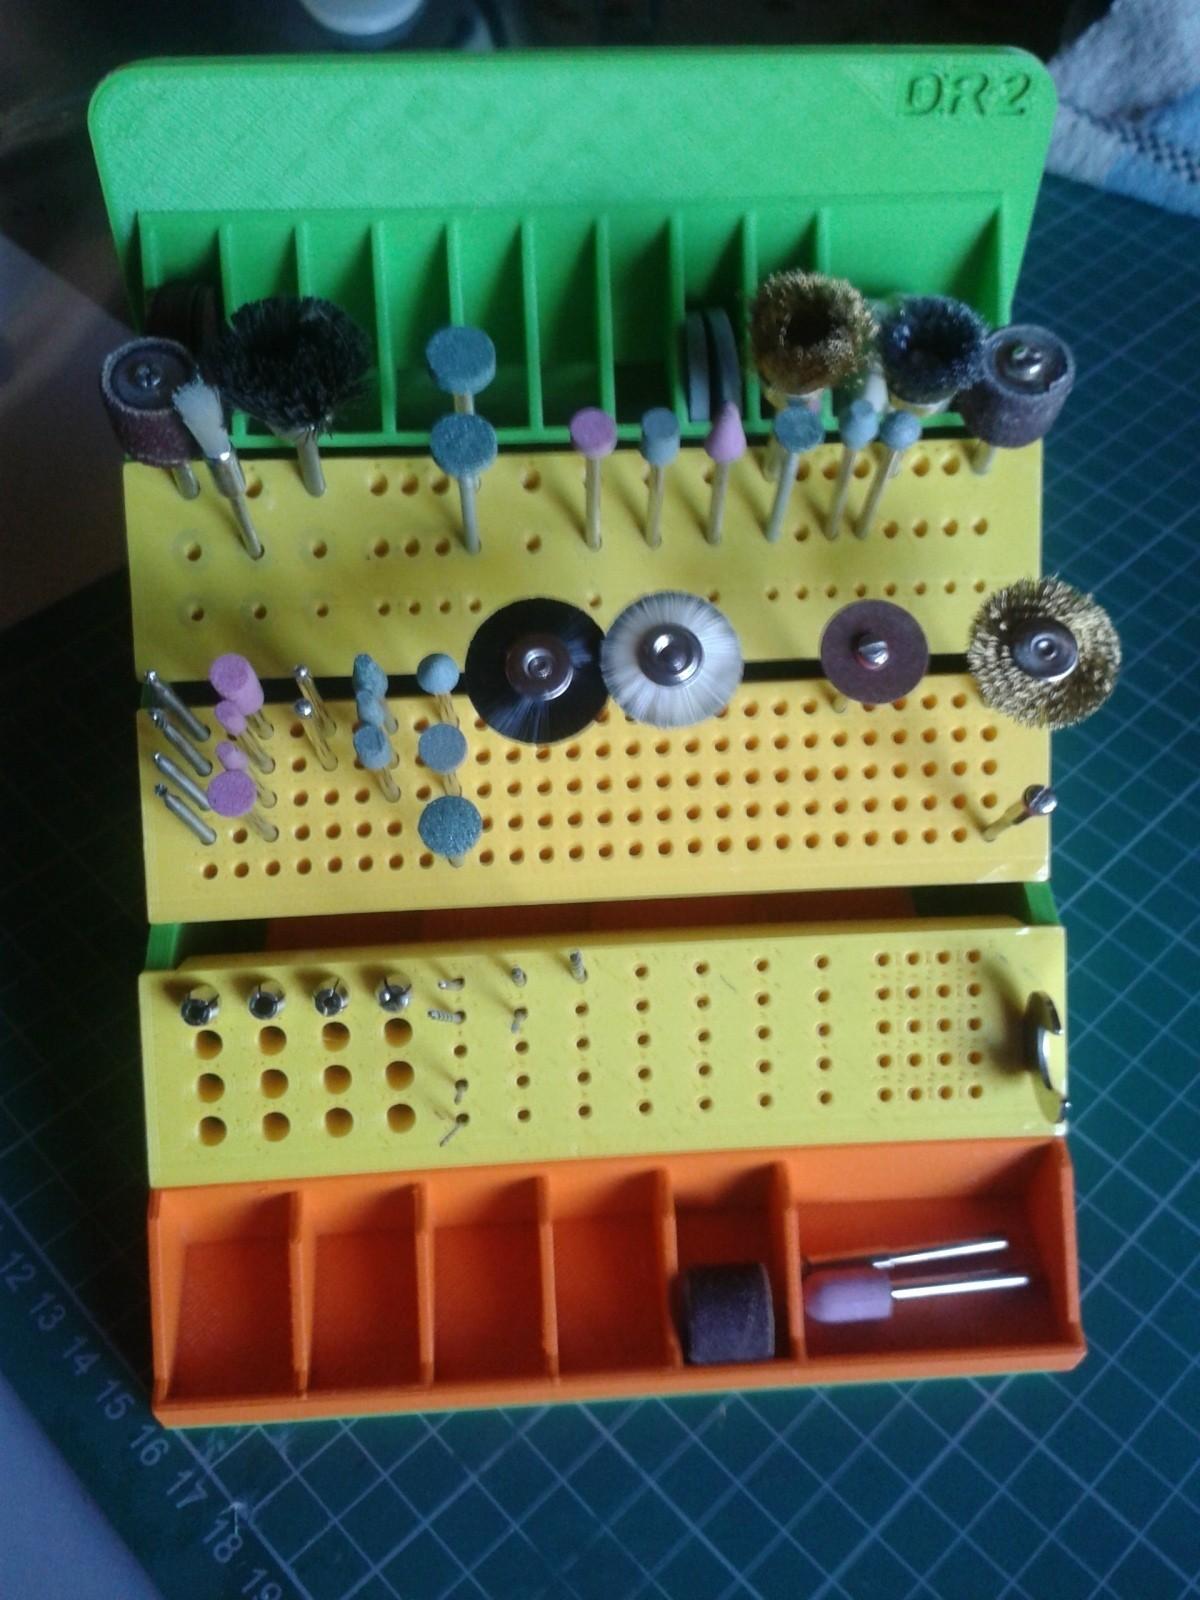 20160506_185415.jpg Download STL file Module for mini drill and c is accessory N ° 2 • 3D printer model, prusai33